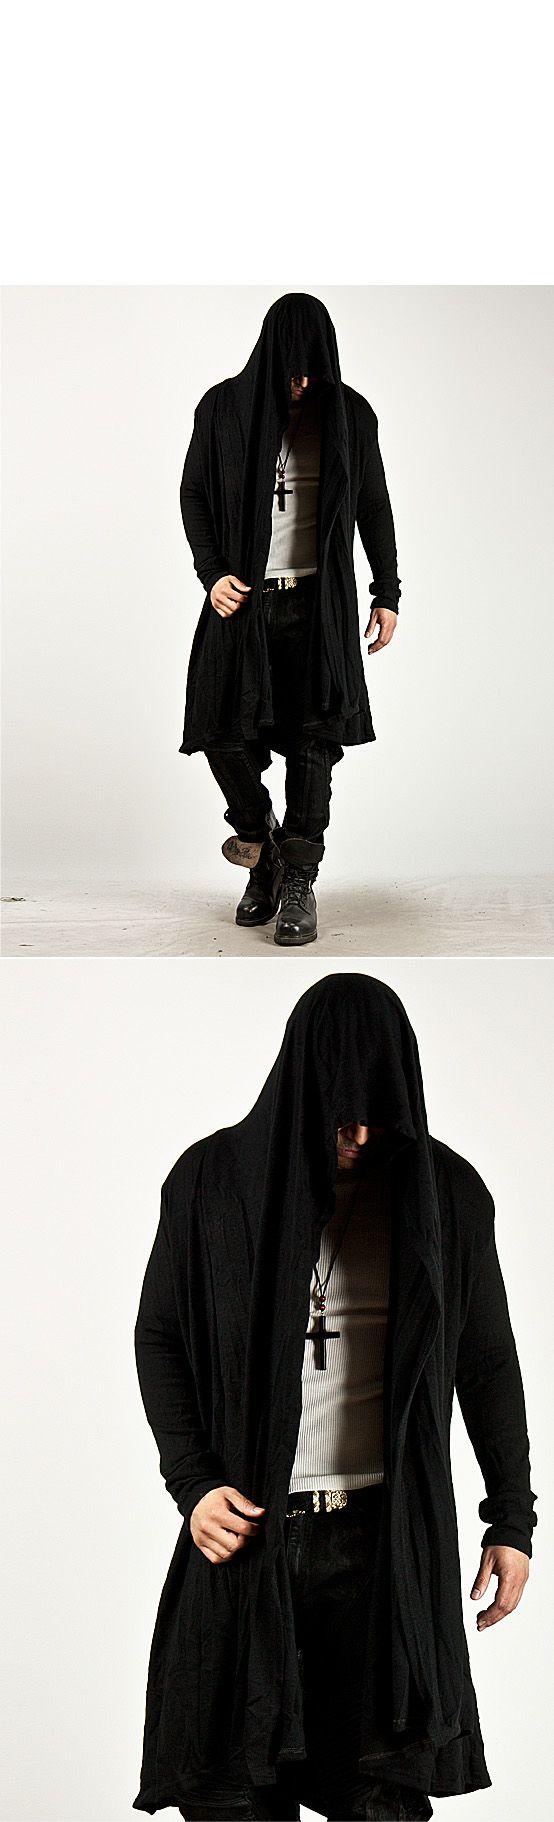 Best 10+ Hooded cardigan mens ideas on Pinterest | Hooded cardigan ...